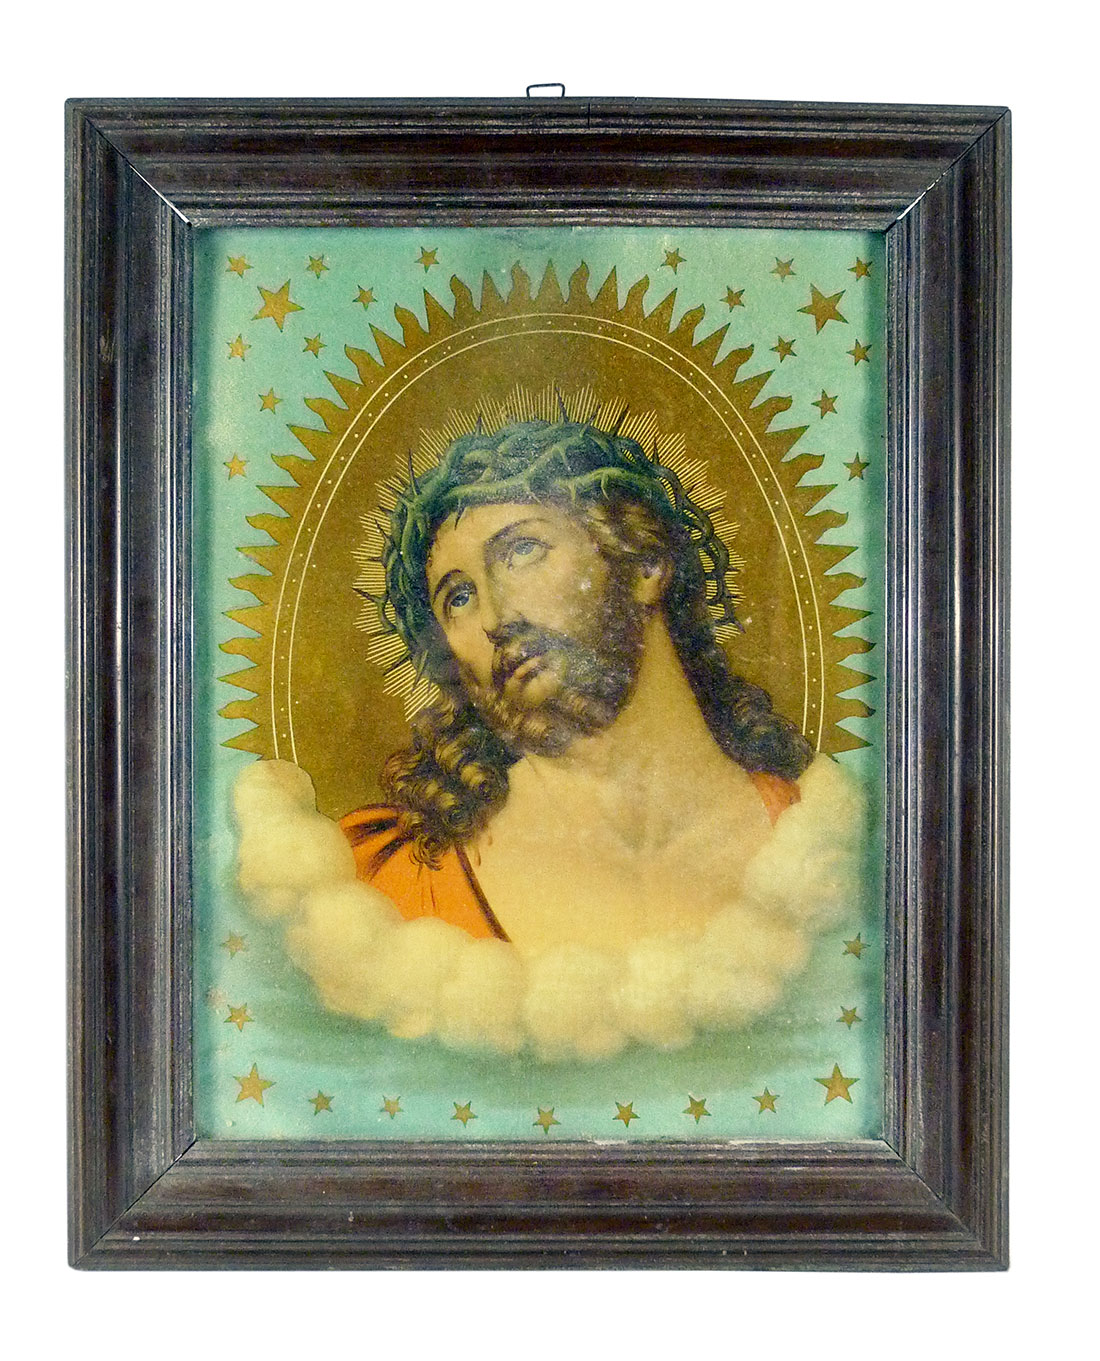 A vintage image of Jesus looking up.